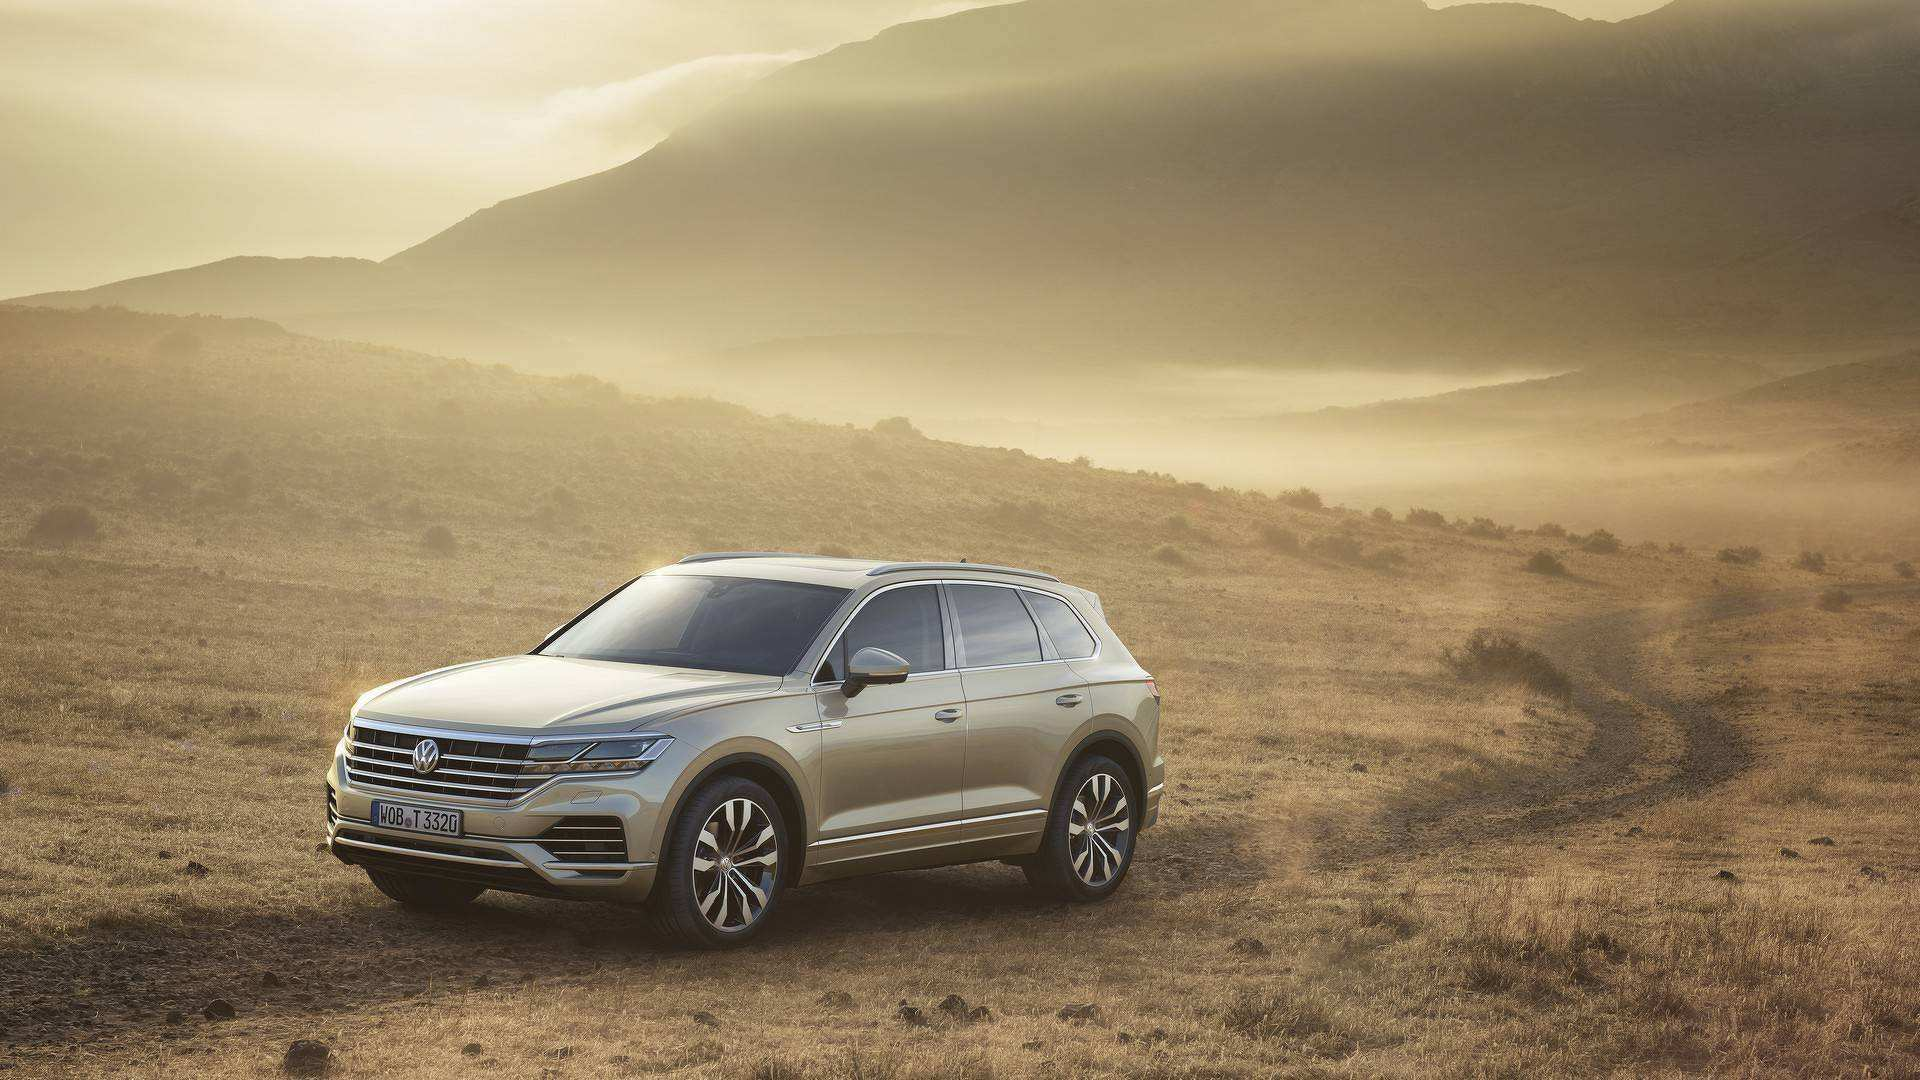 56 New VW Touareg 2020 Usa Research New for VW Touareg 2020 Usa